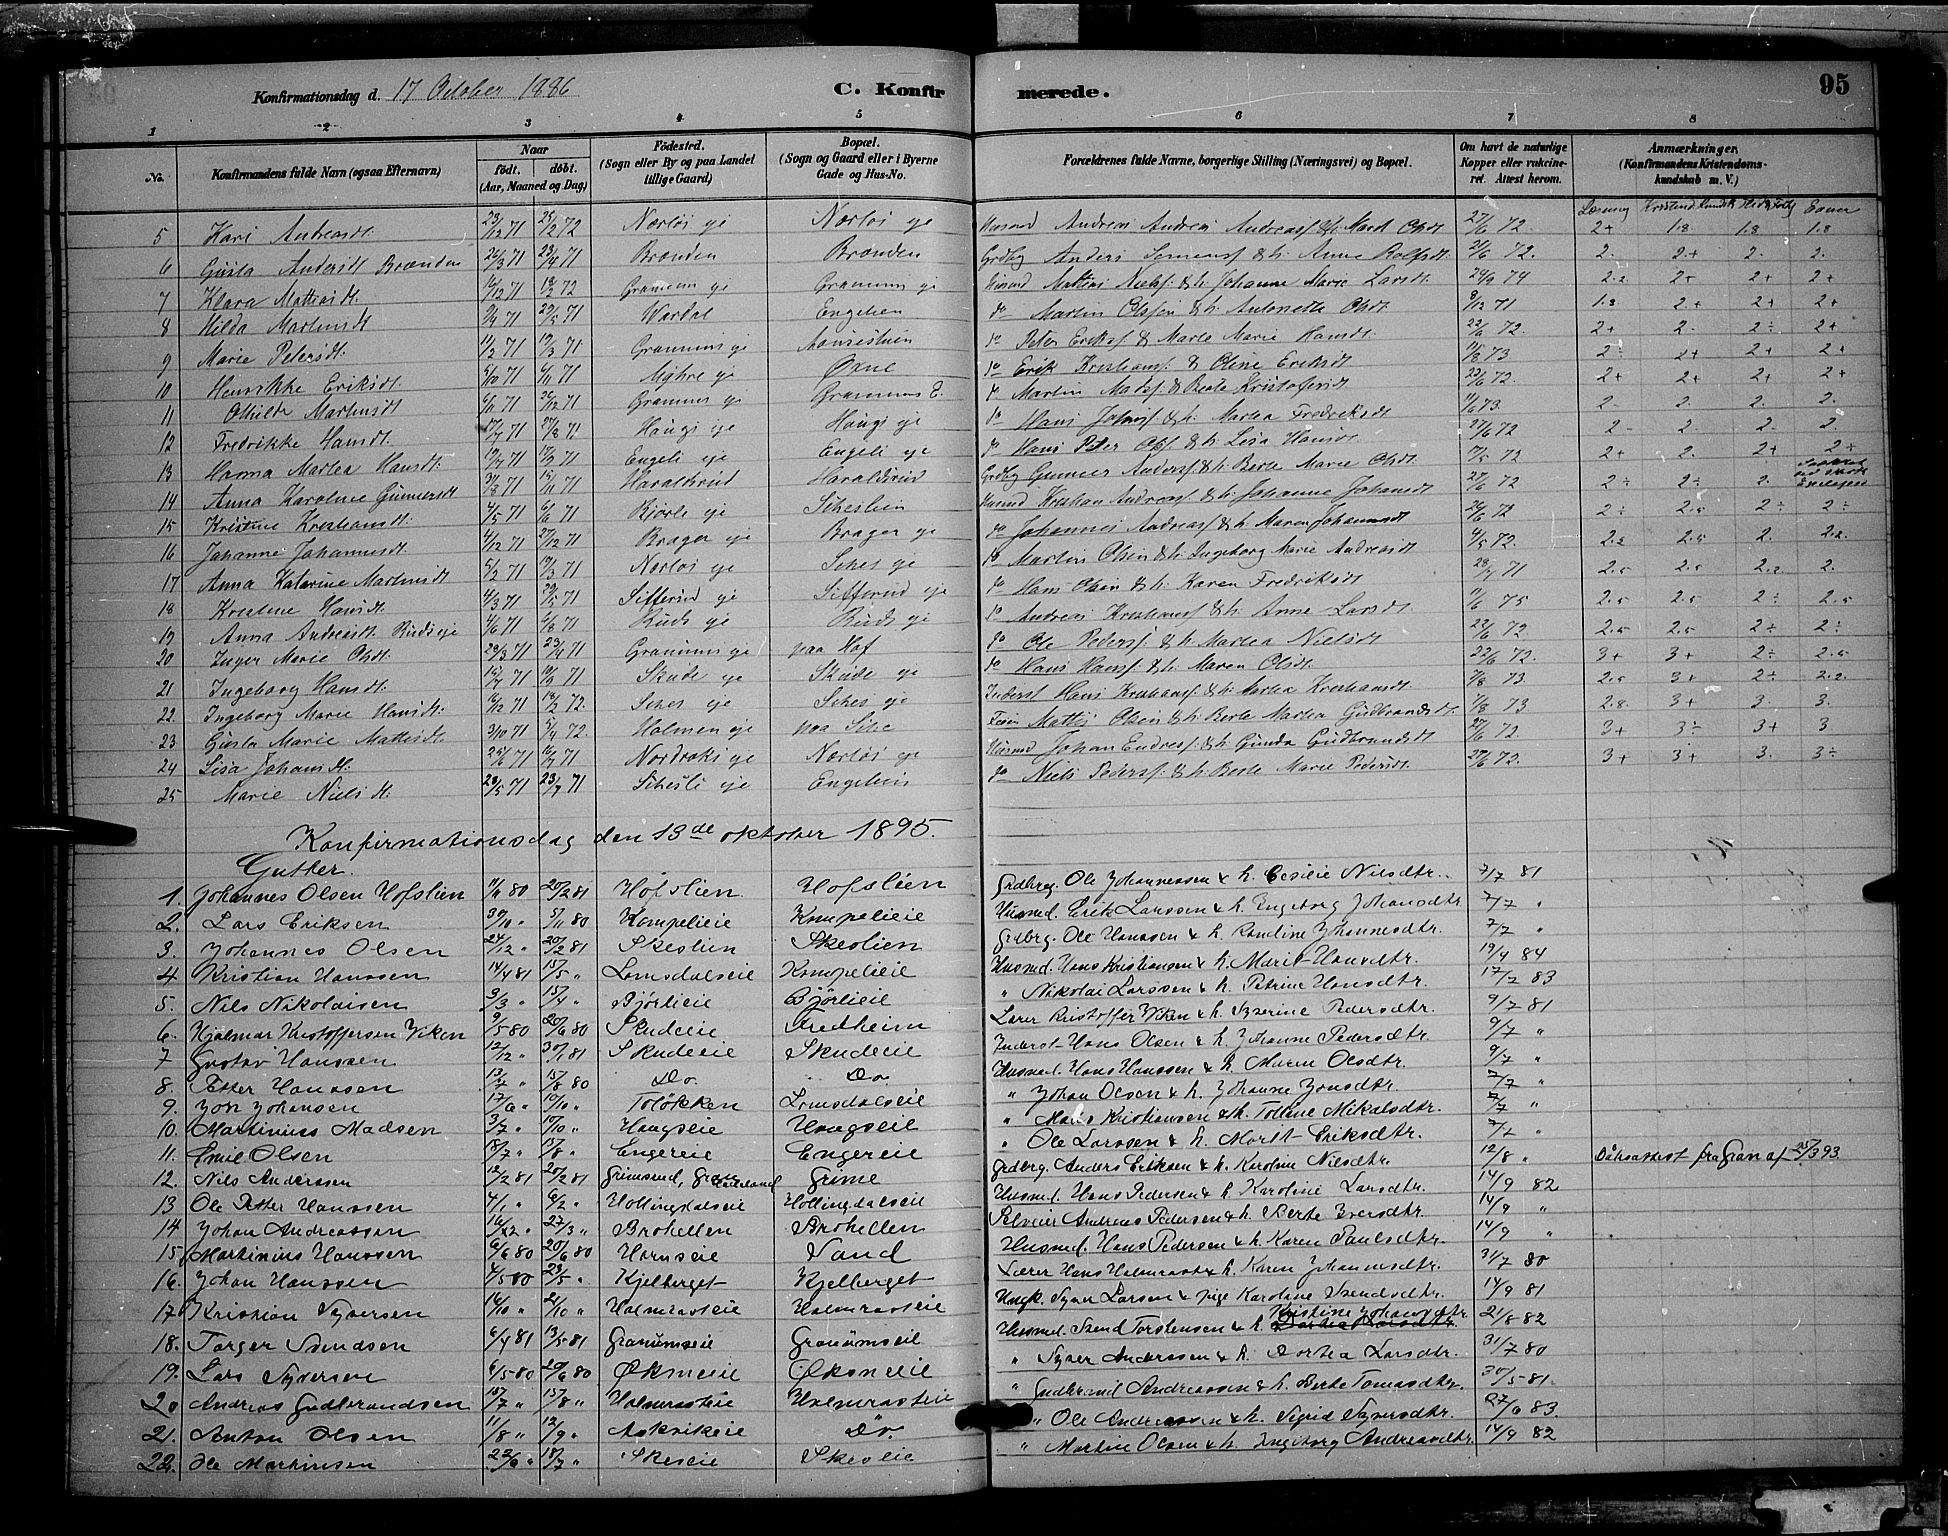 SAH, Søndre Land prestekontor, L/L0002: Klokkerbok nr. 2, 1884-1900, s. 95